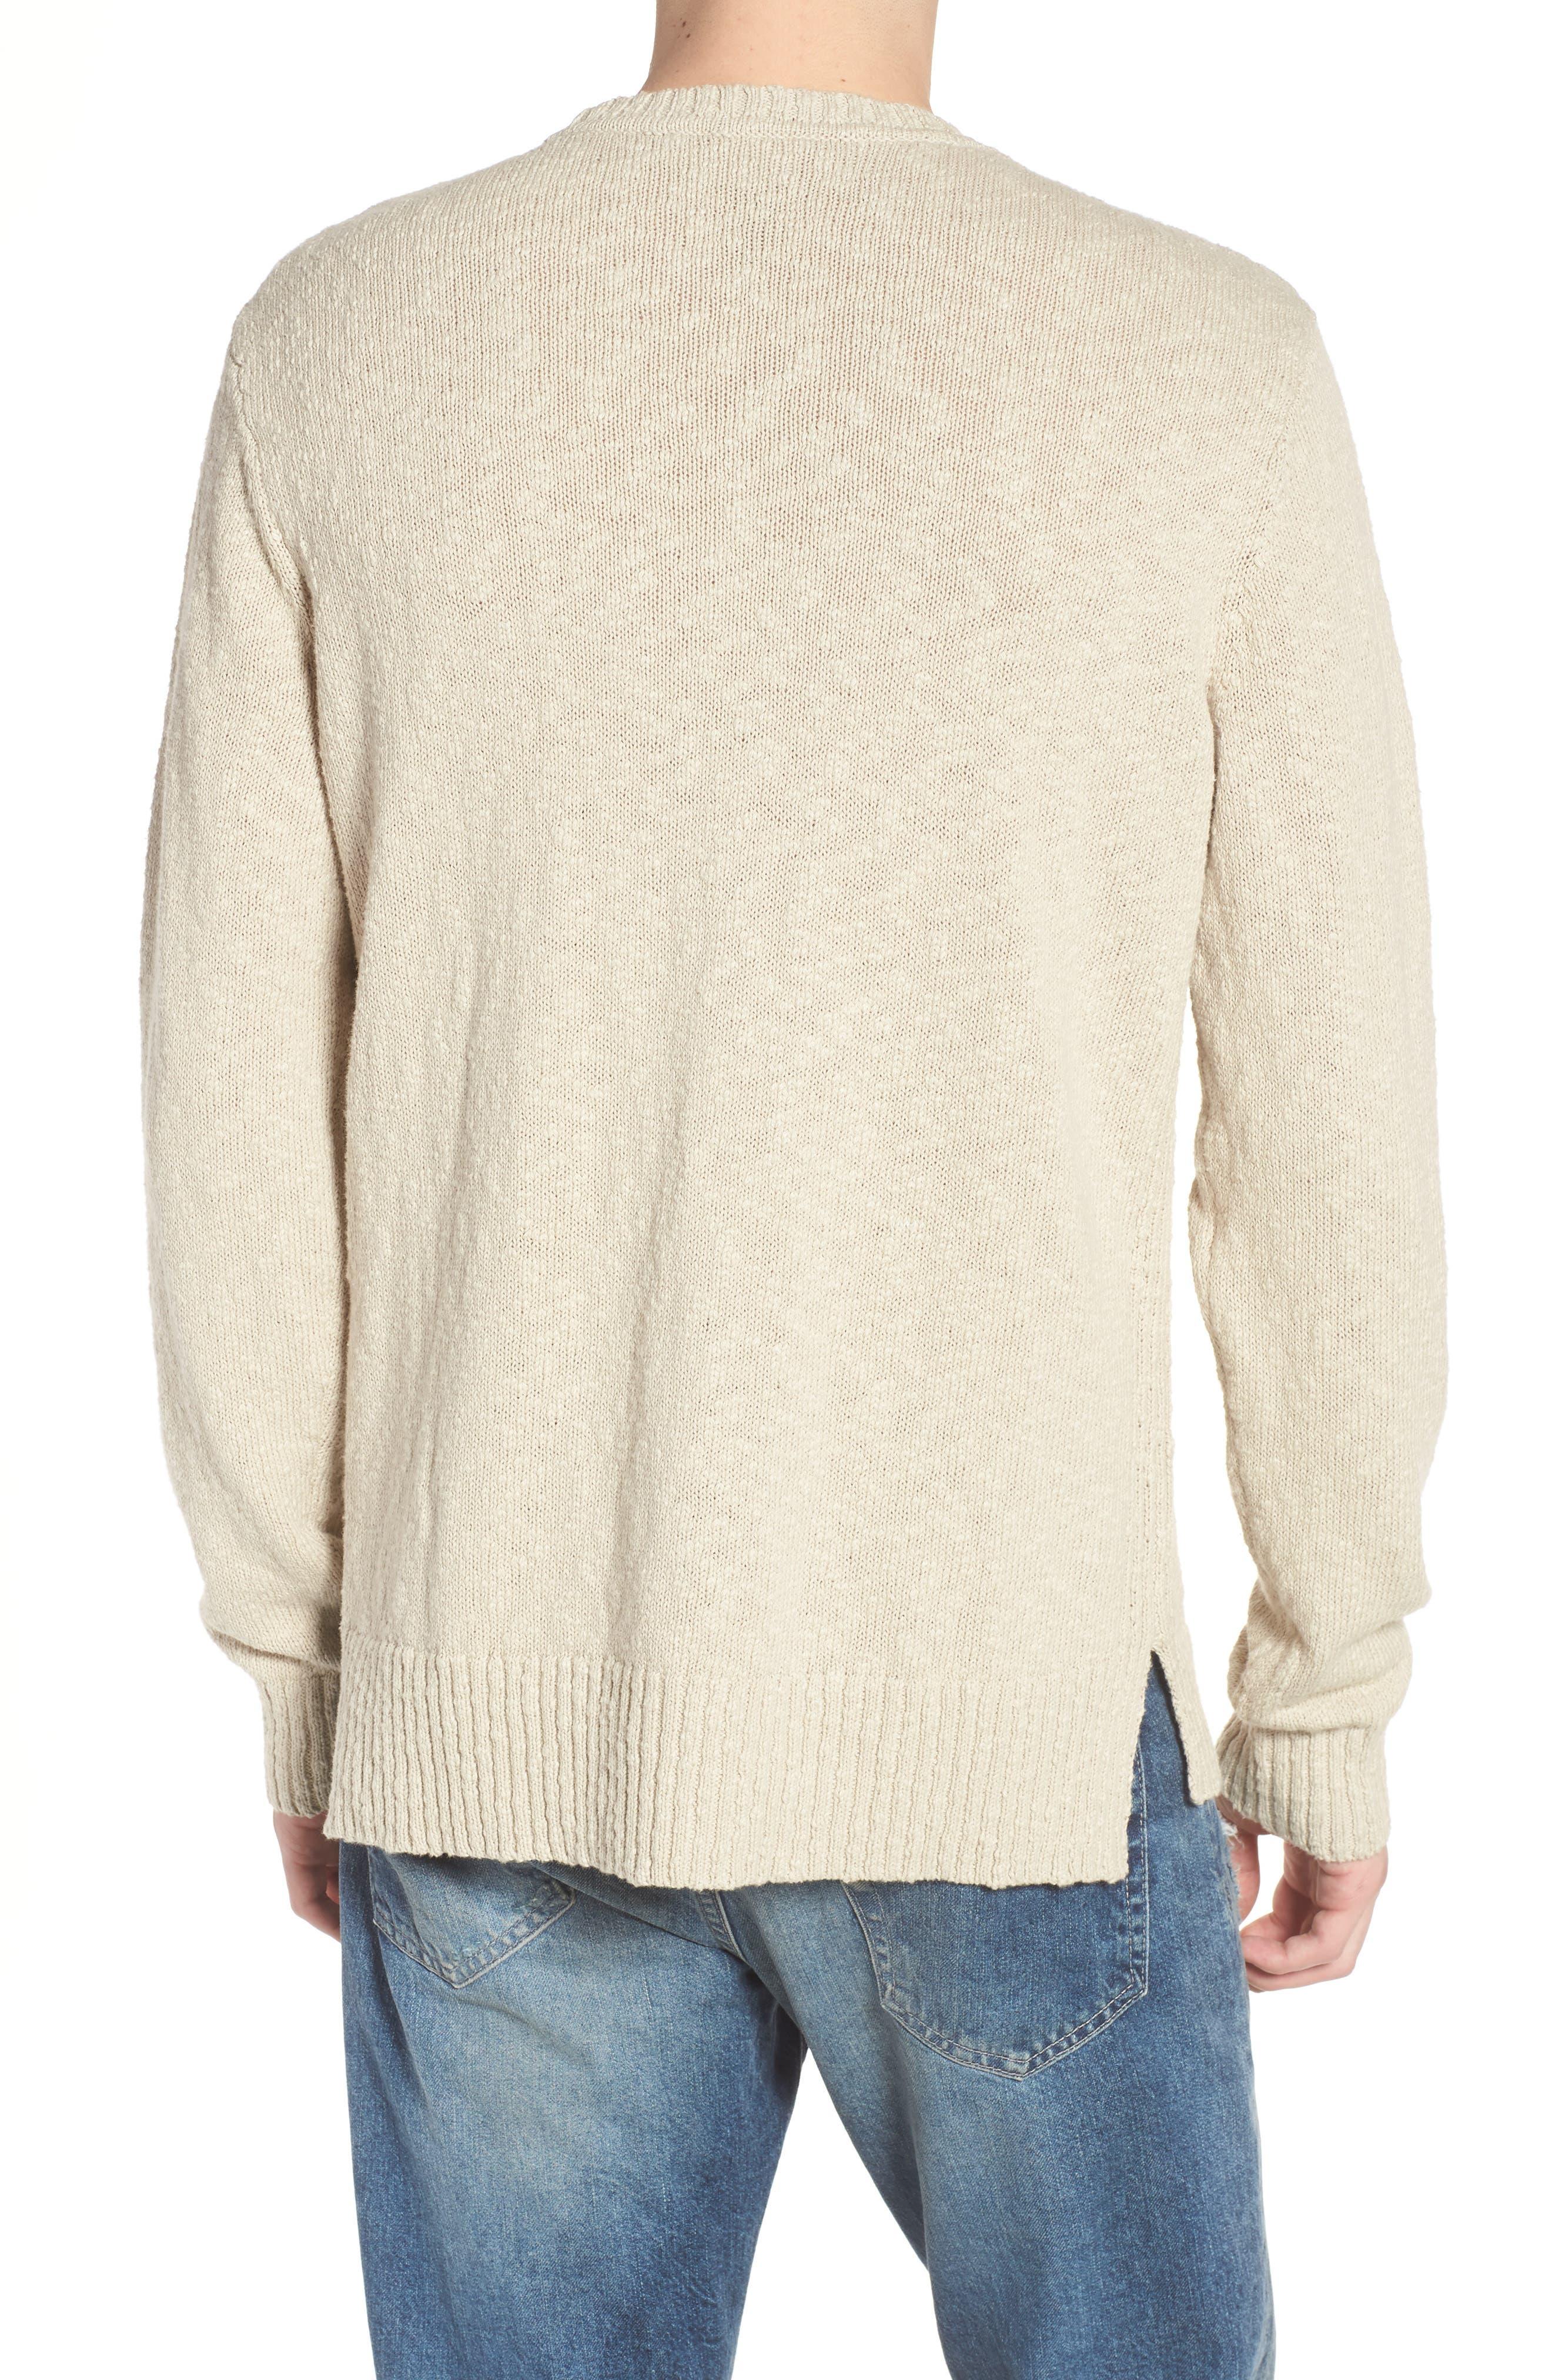 Deklyn Slim Fit Crew Sweater,                             Alternate thumbnail 2, color,                             Mineral Veil